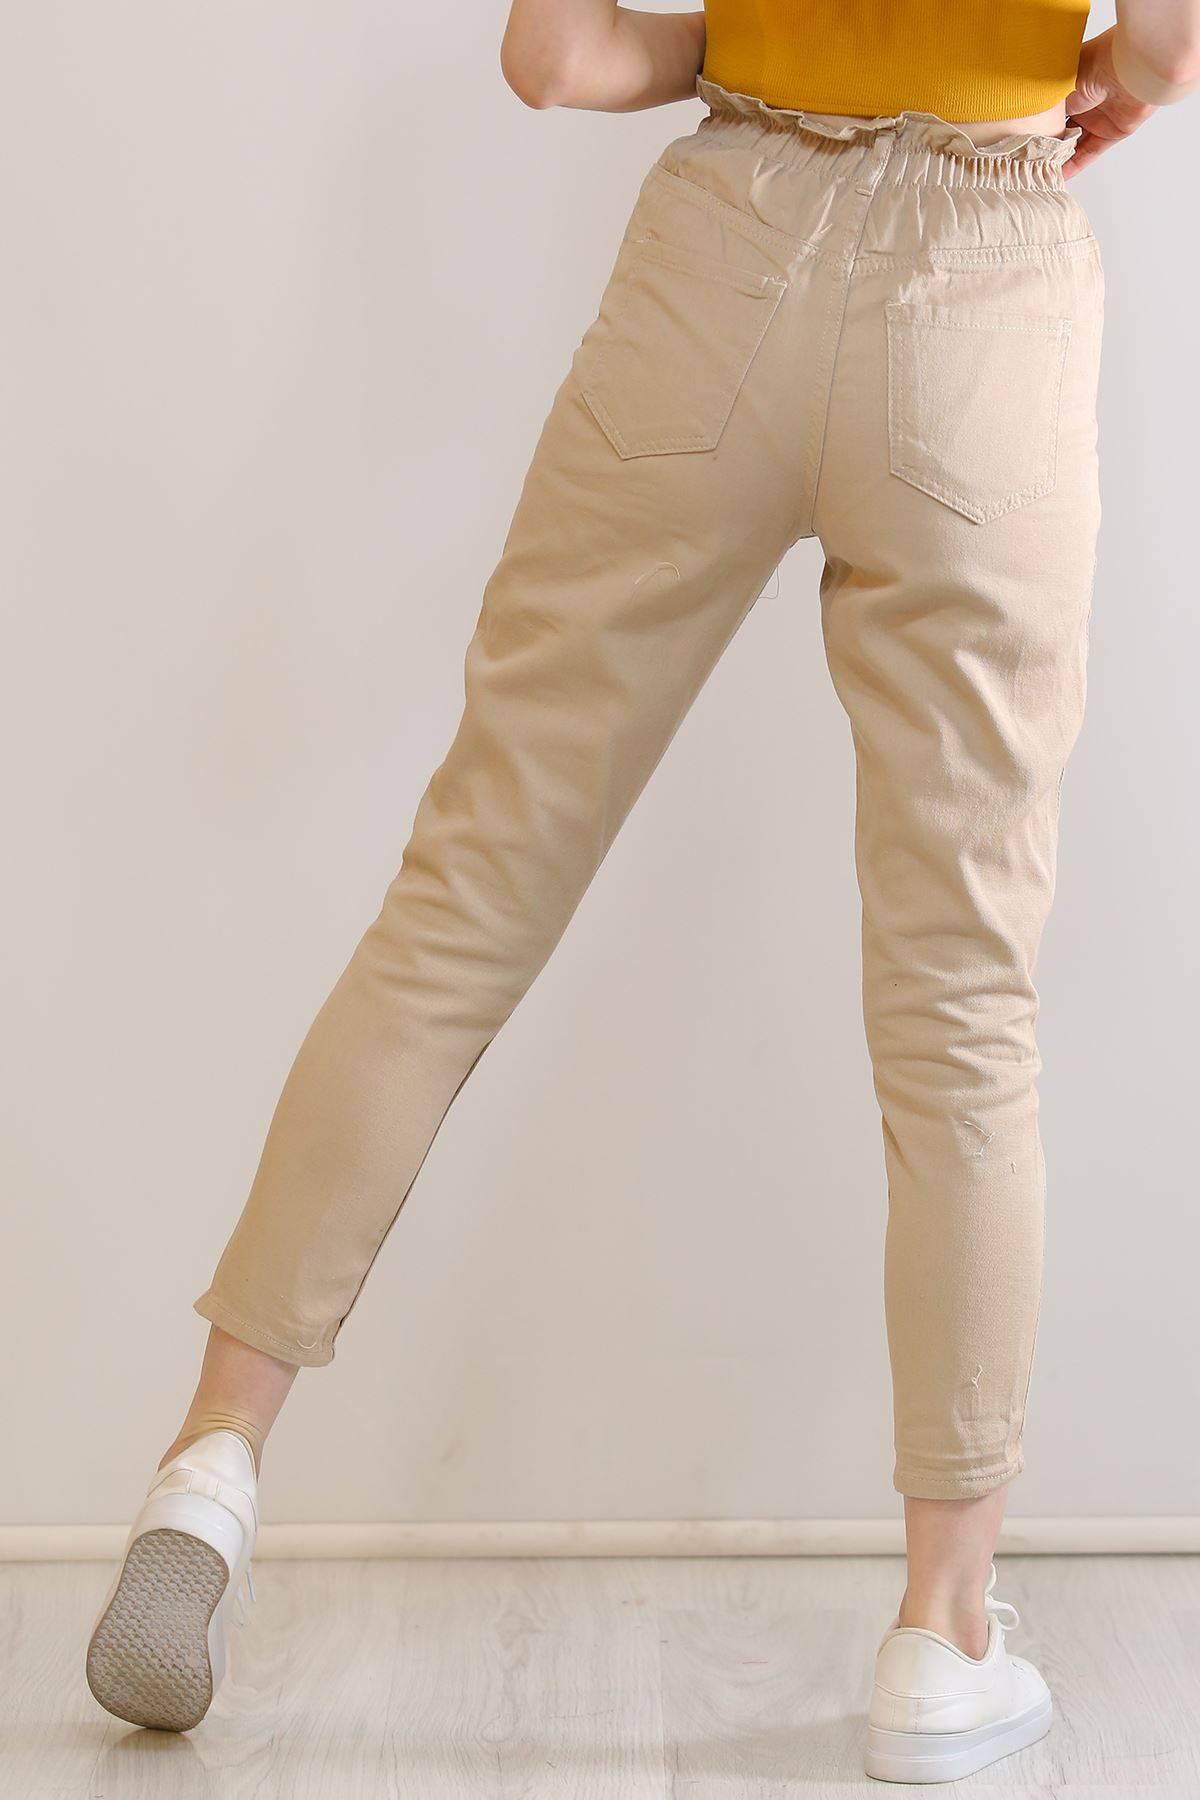 Çift Düğmeli  Kot Pantolon Taş - 5862.299.